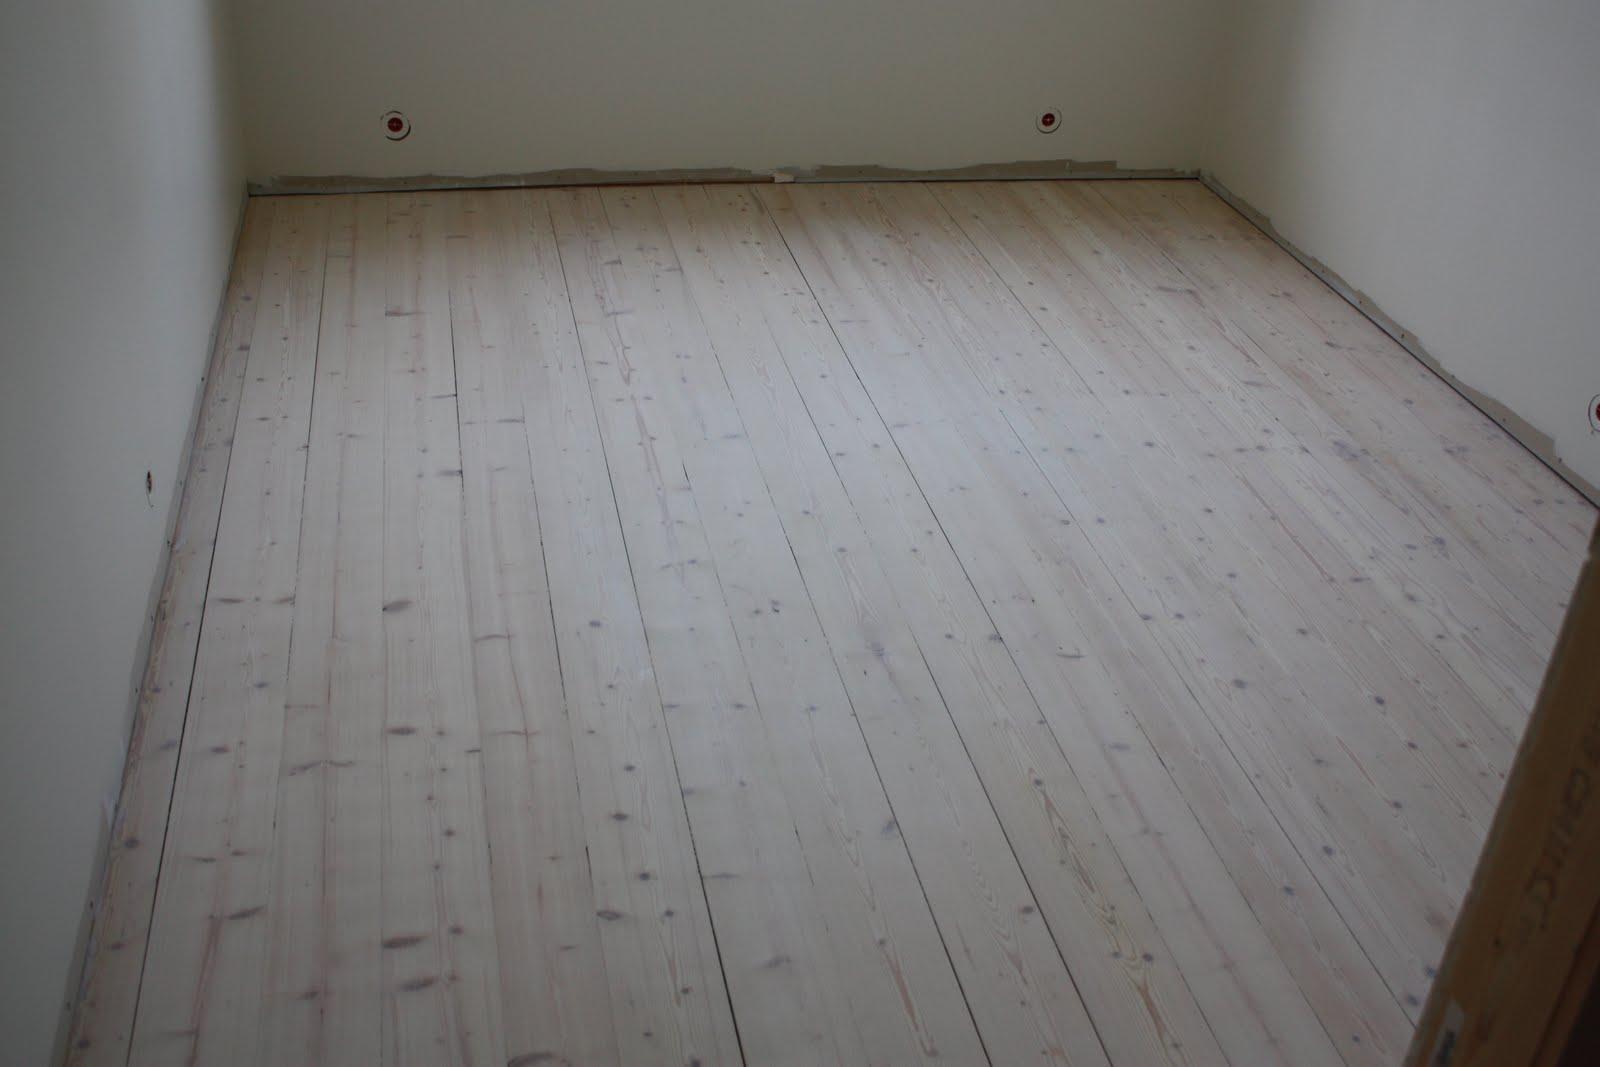 gulv barnerom : Gulv Barnerom. Affordable Bolon Carpet Googlesk With Gulv ...